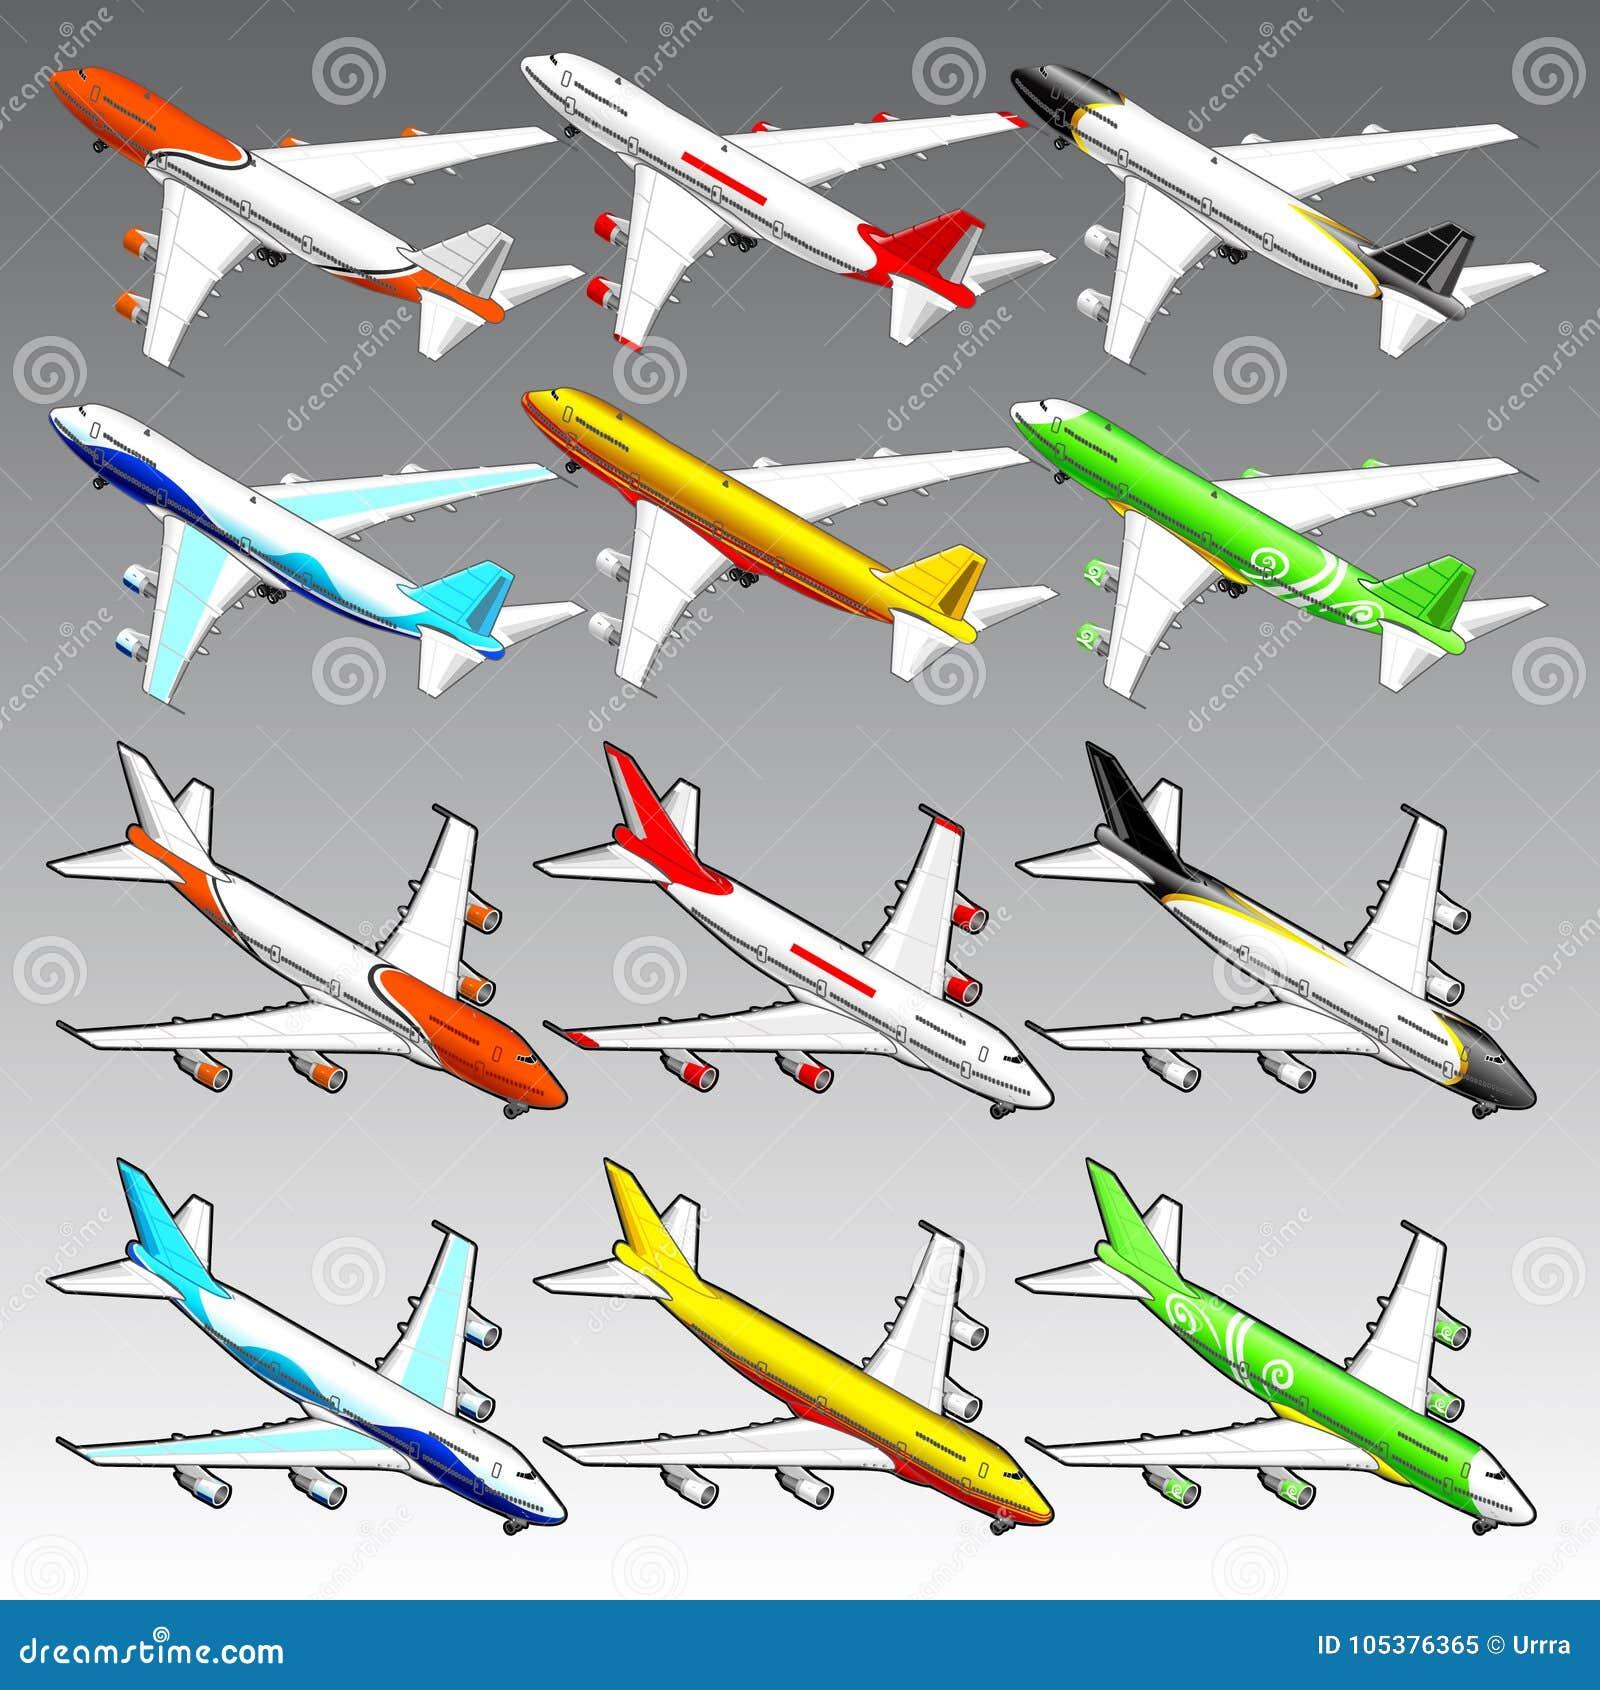 3d isometric airplanes illustration